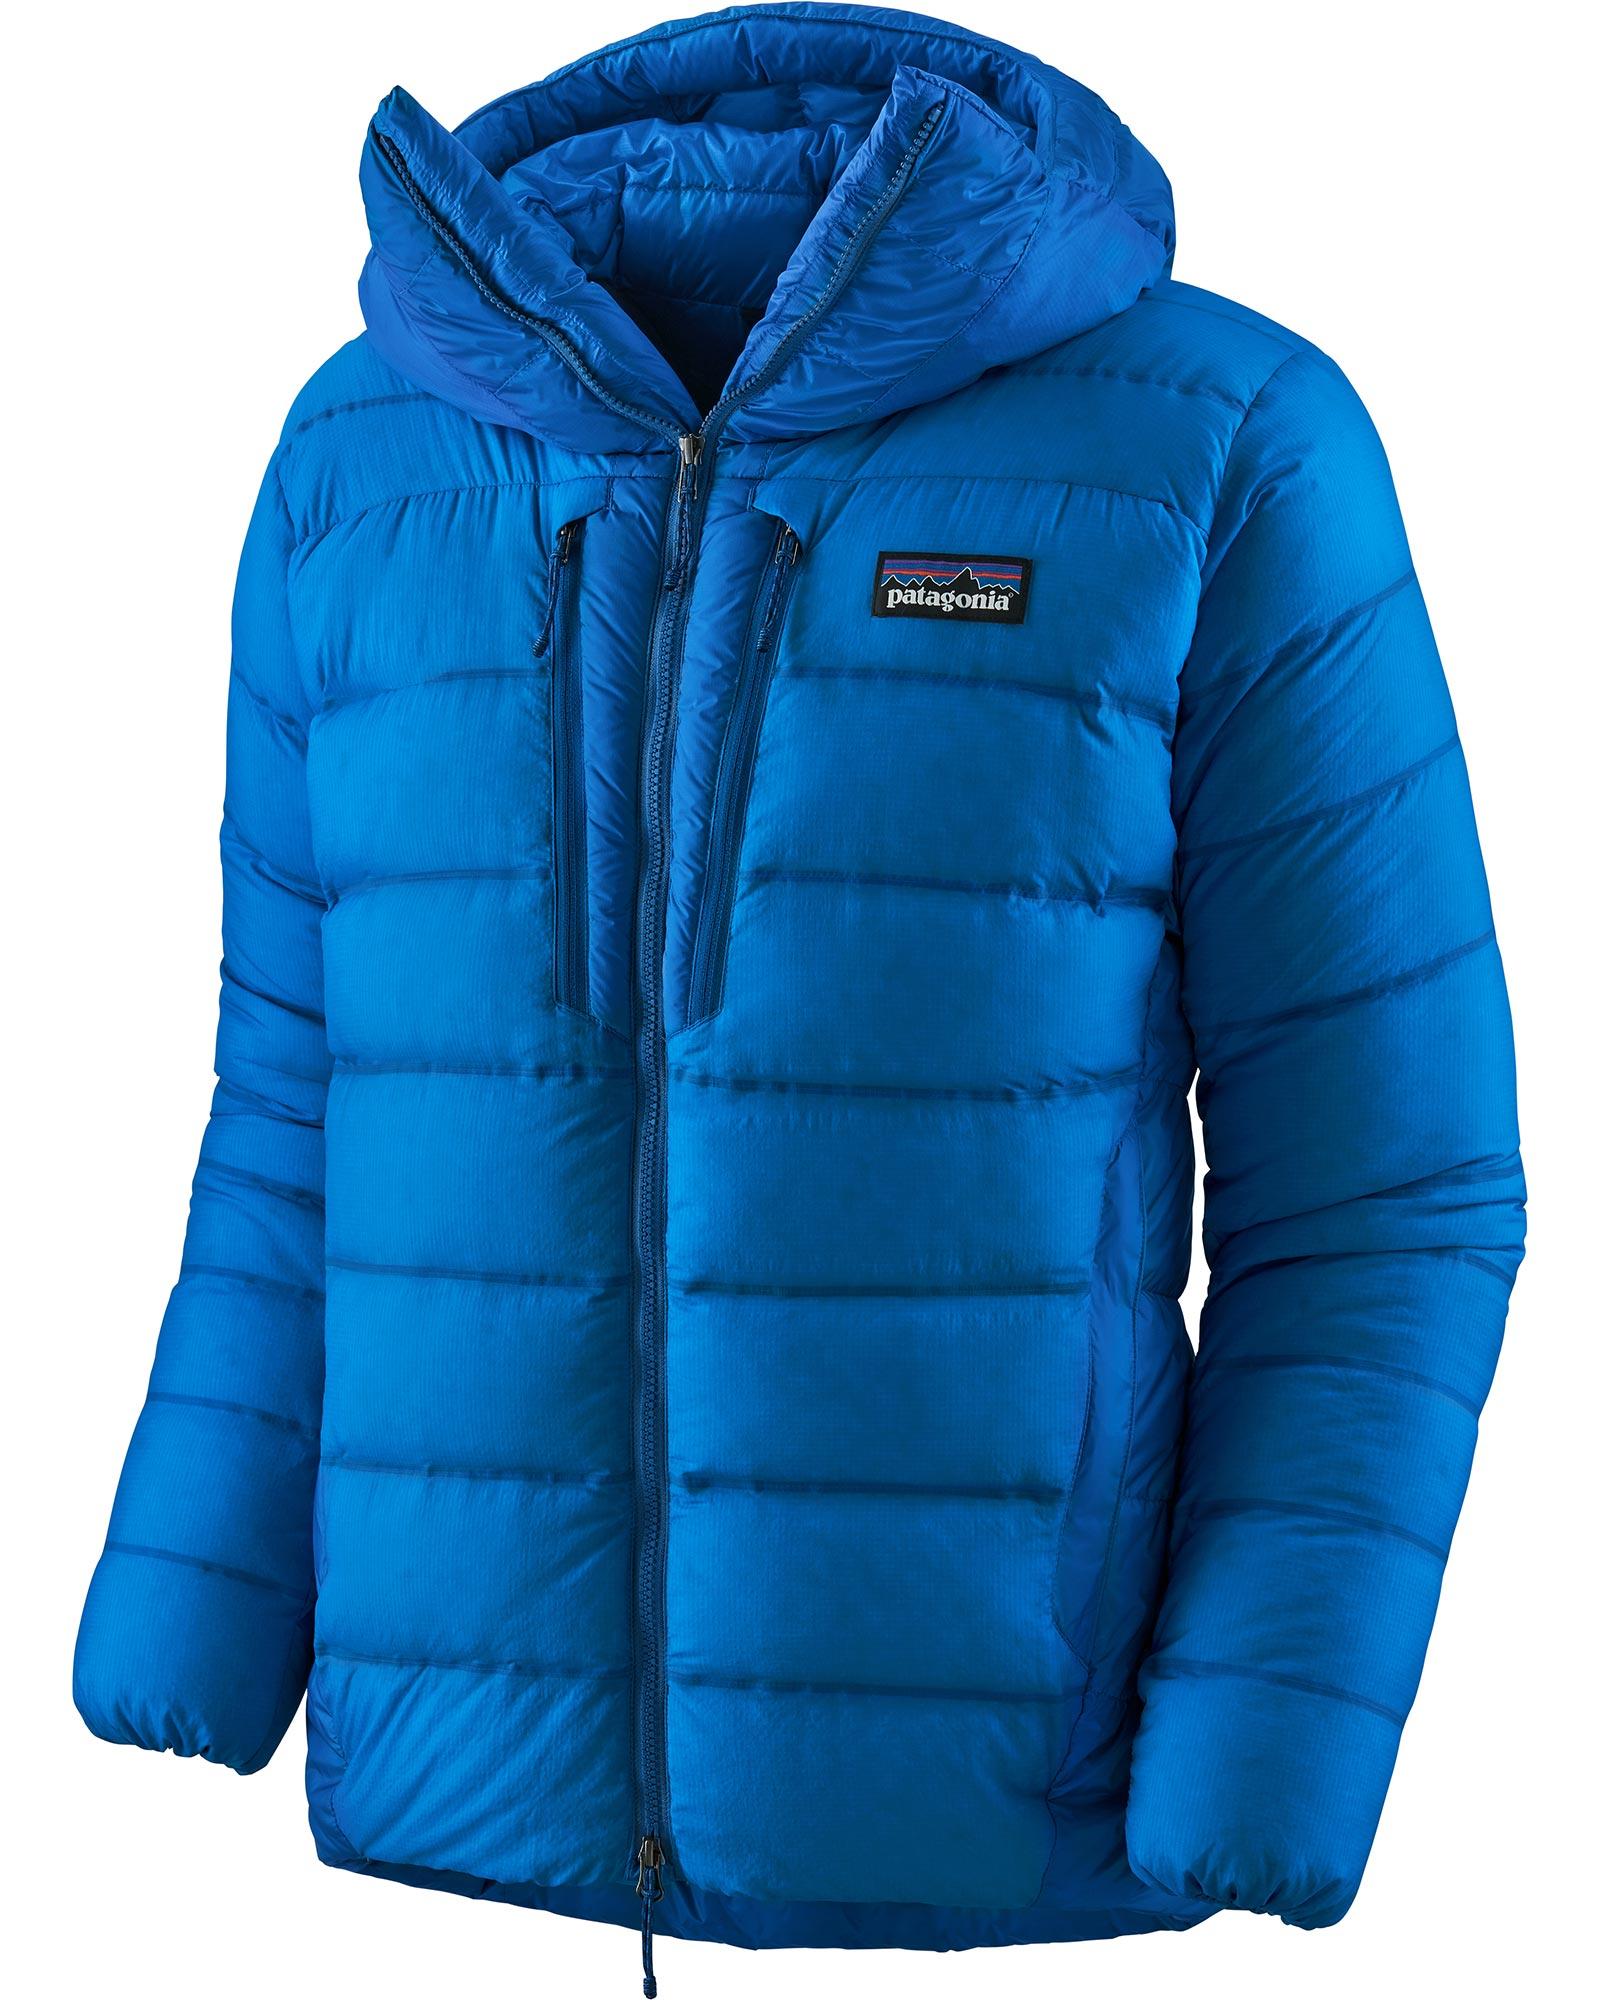 Patagonia Men's Grade VII Down Parka Jacket 0